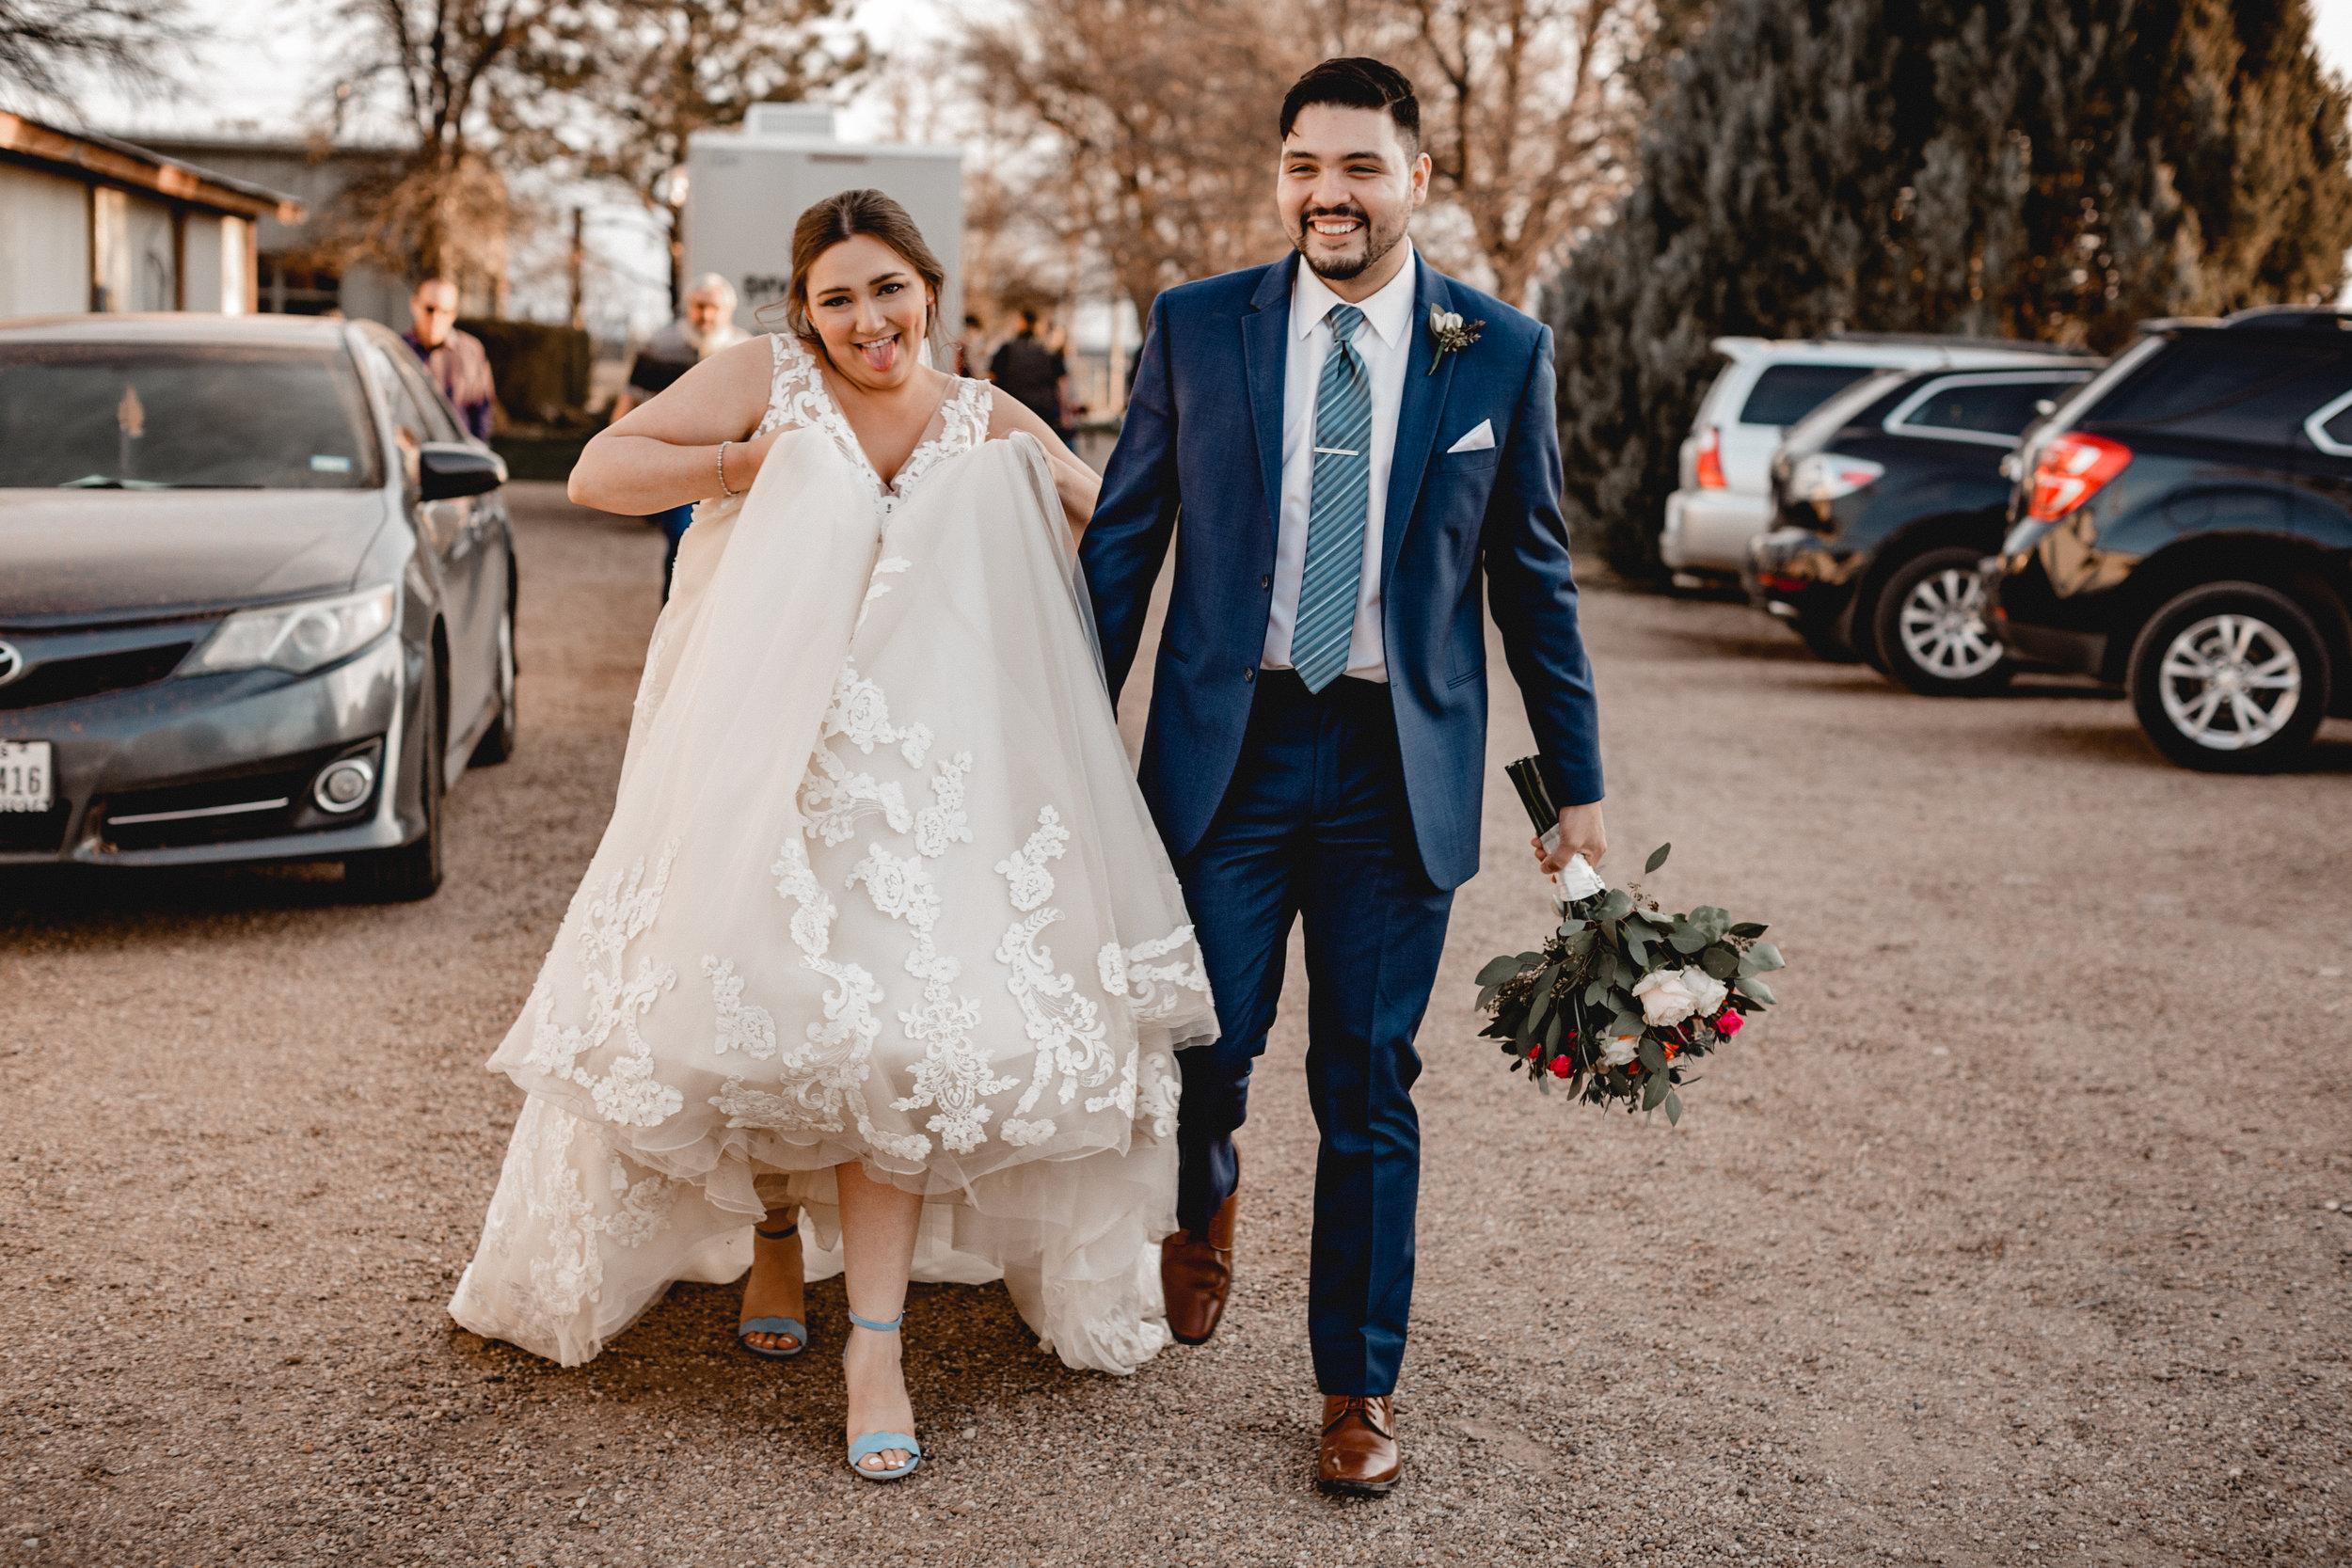 Newlyweds-81.jpg